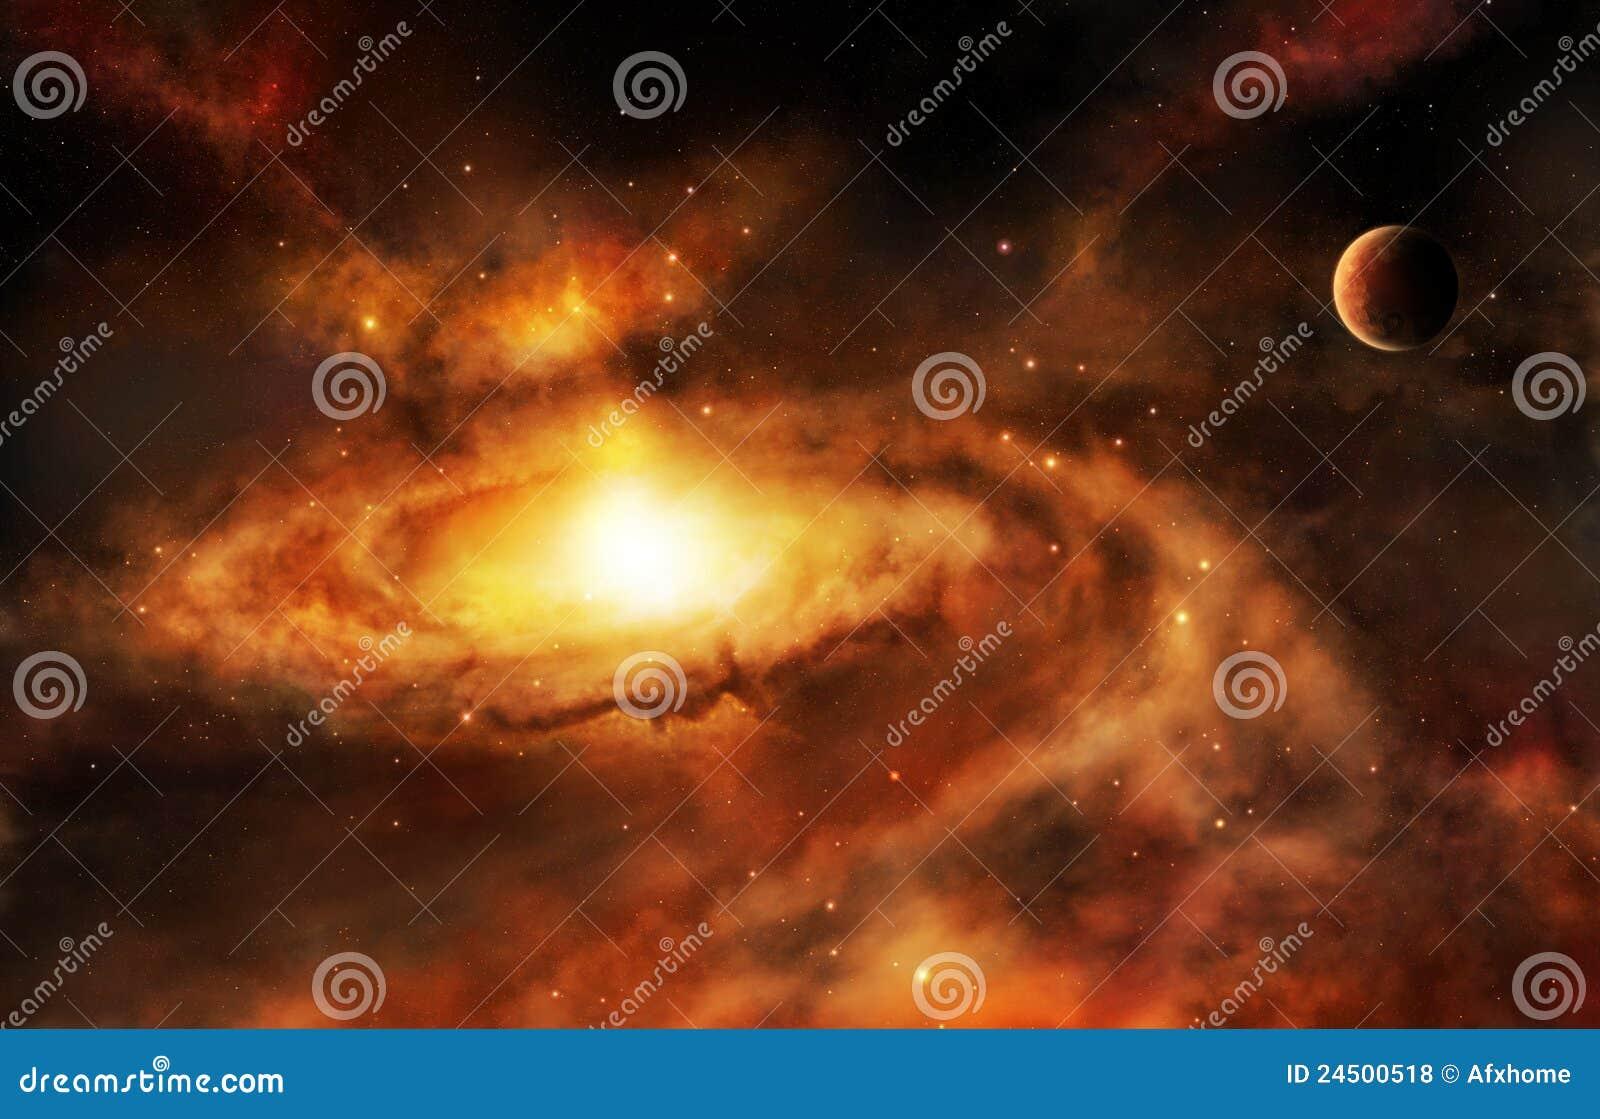 Galaxiekernnebelfleck im Weltraum